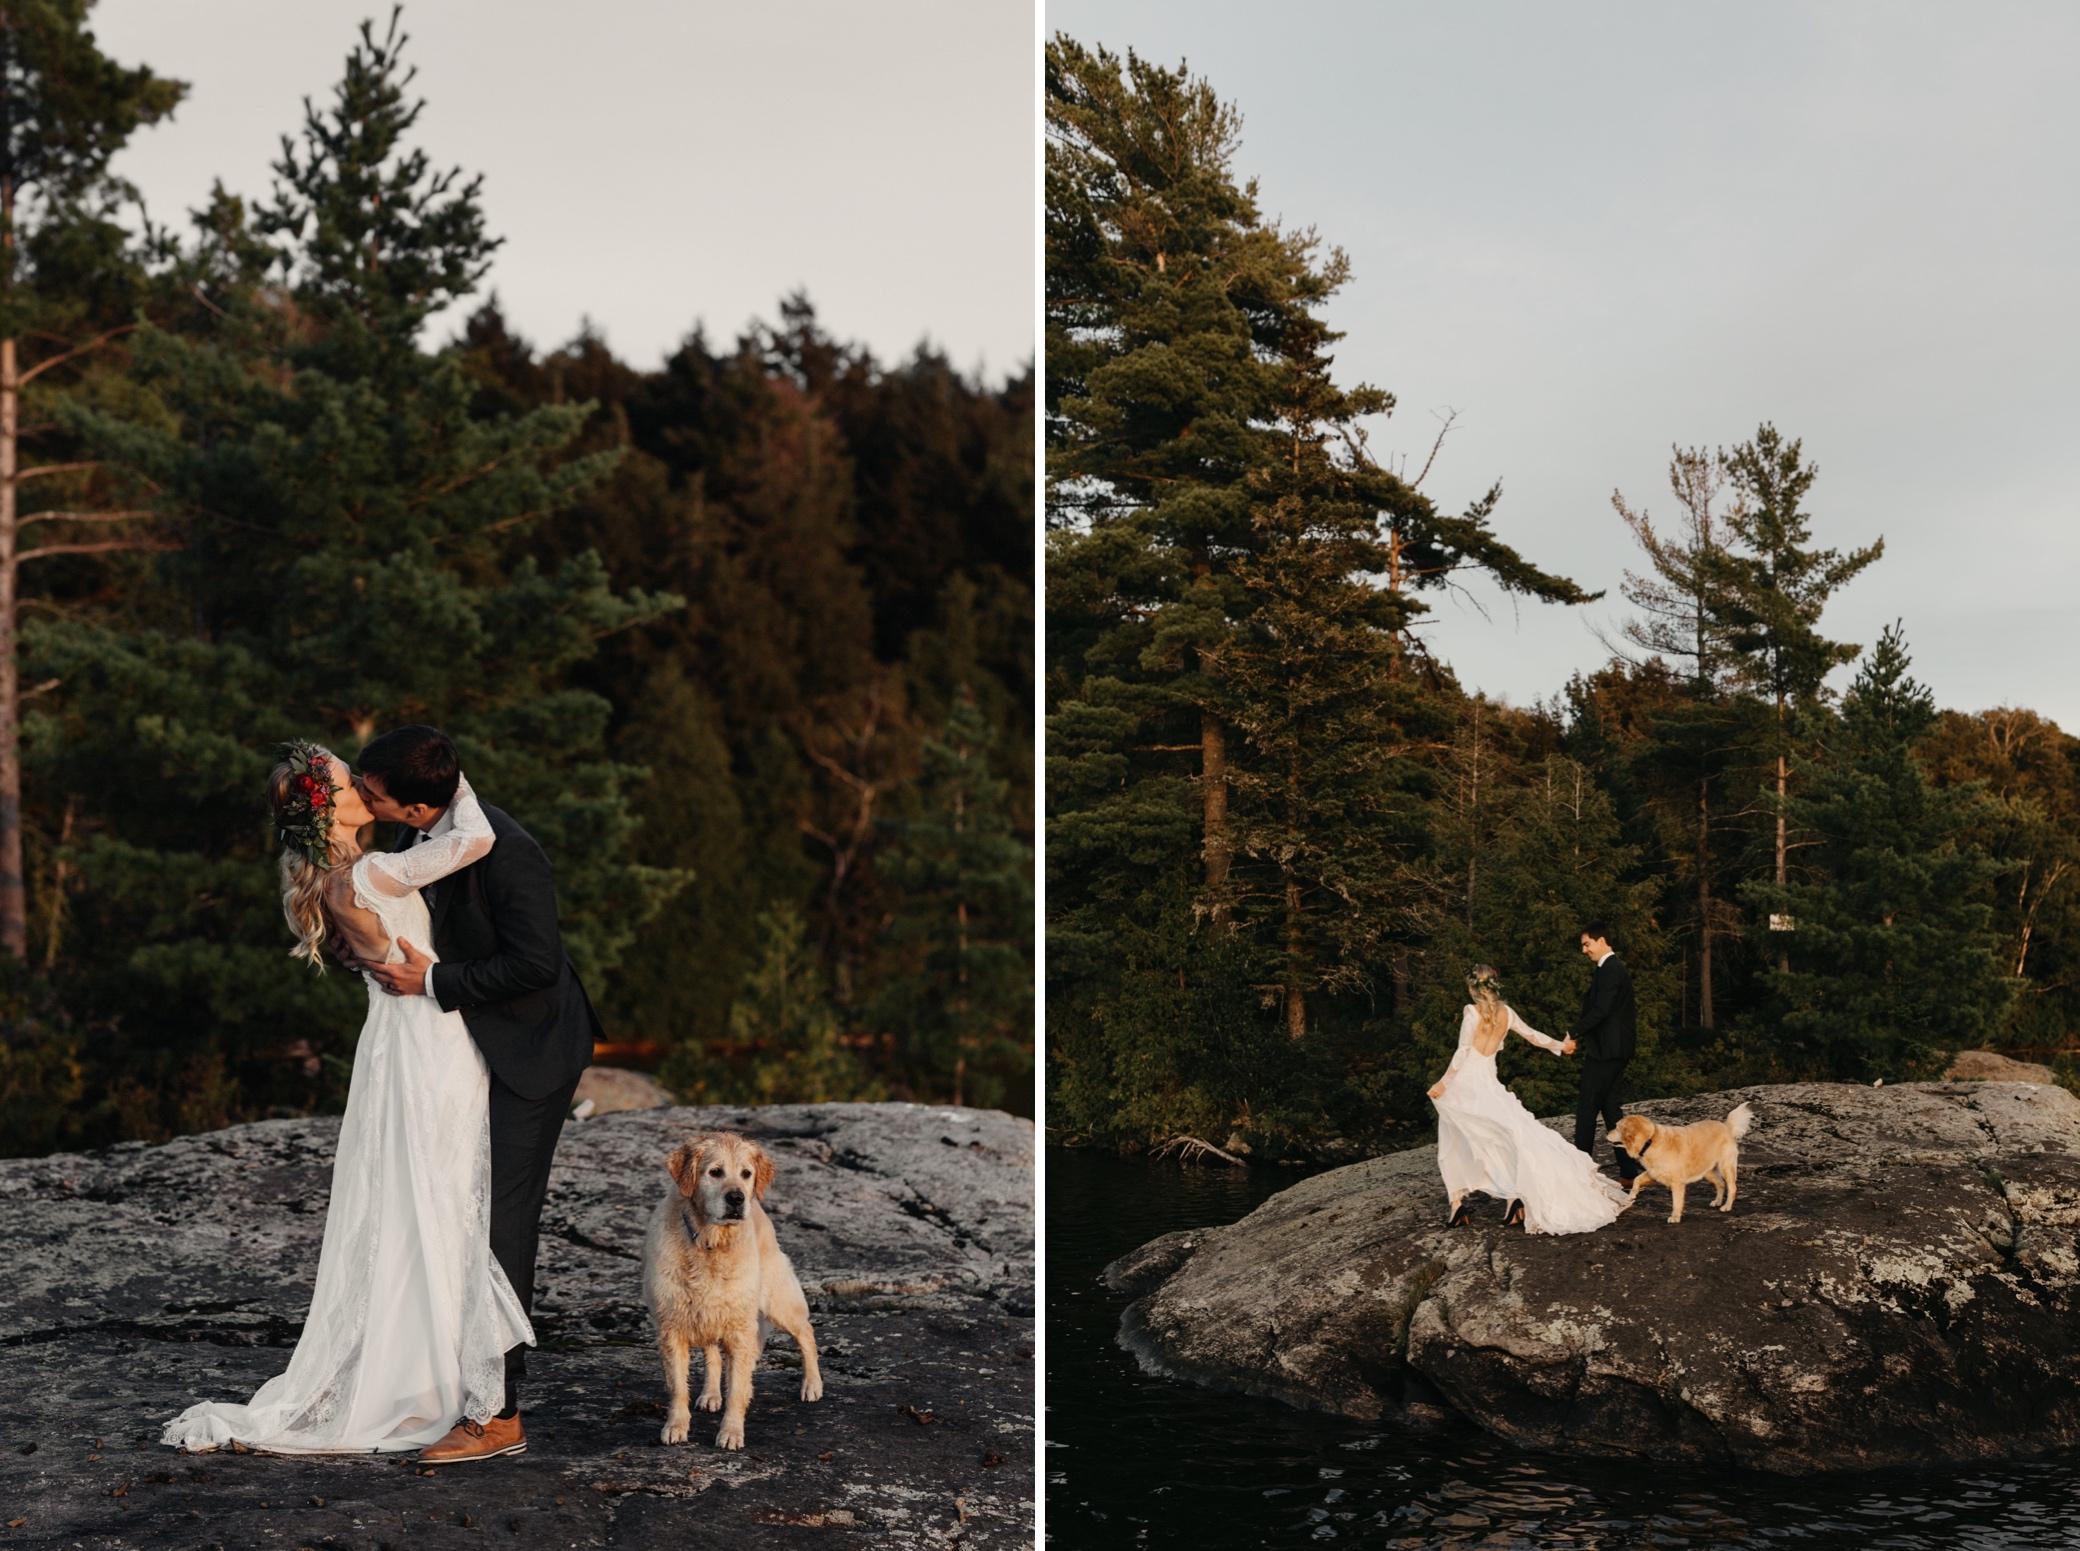 129_Huntsville Wedding  (593 of 689)_Huntsville Wedding  (580 of 689)_Ontario_Cottage_Huntsville_Algonquin_Wedding.jpg